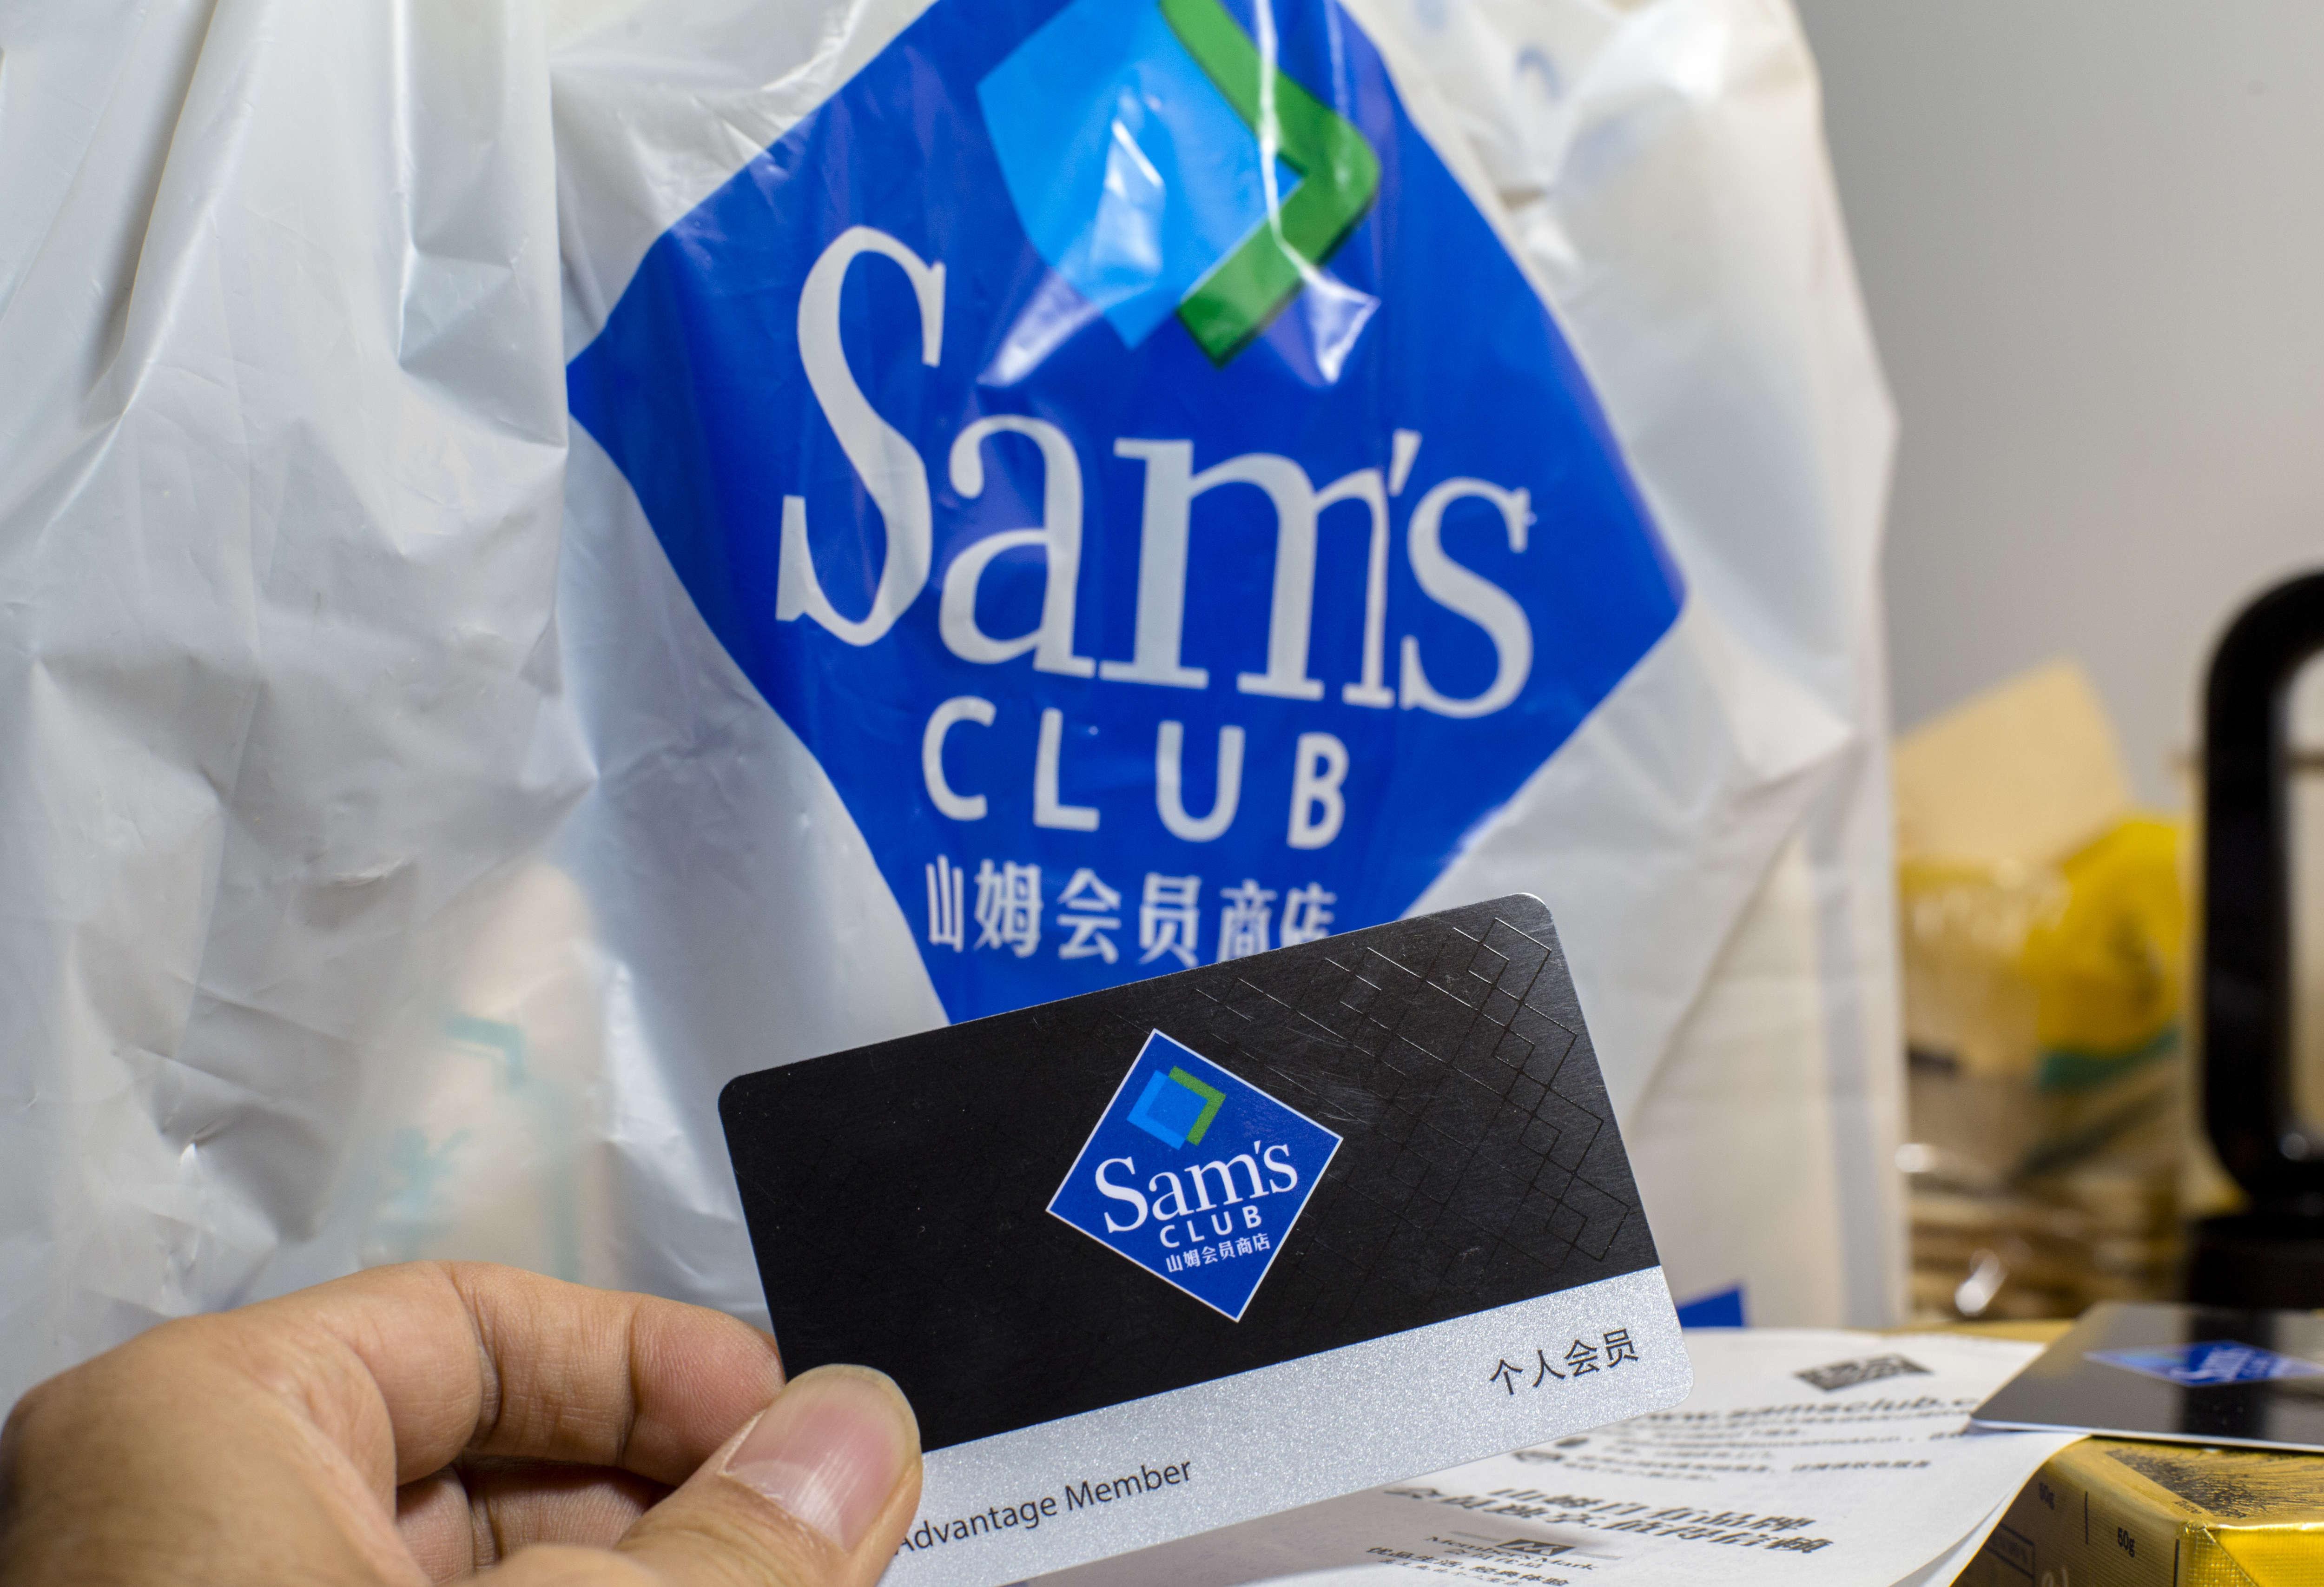 Sam's Club membership card. At present, three of the top...